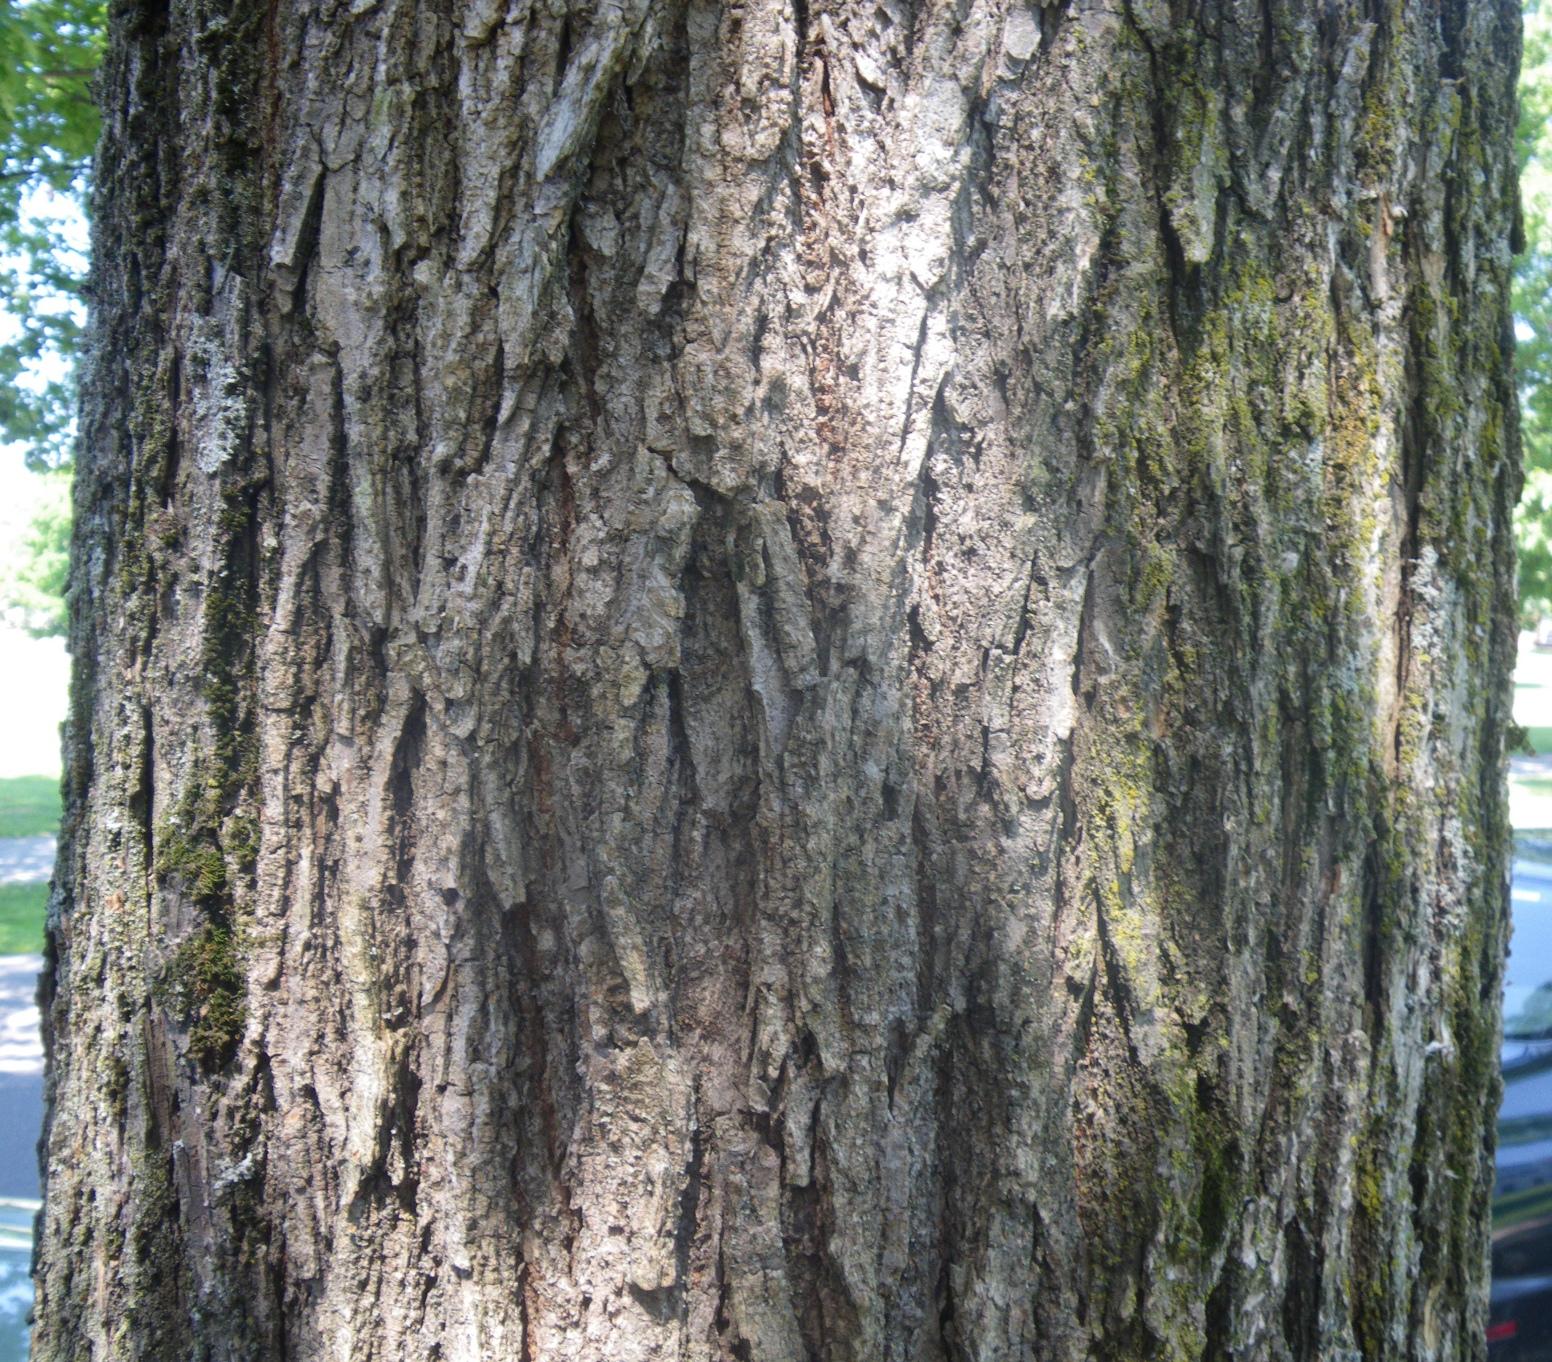 Elm Tree Identification by Bark 1552x1362